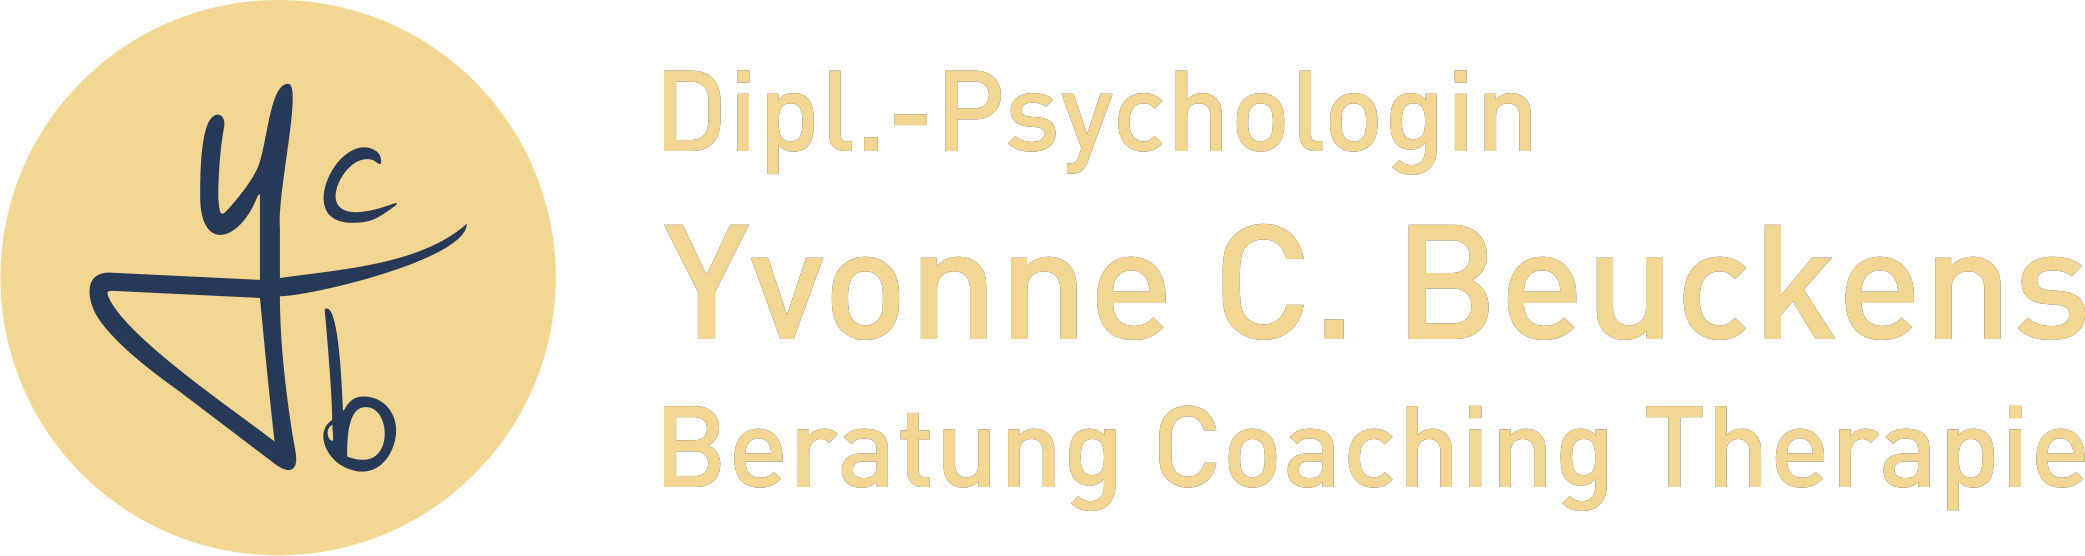 Logo Y.Beuckenes gold marine bg remove